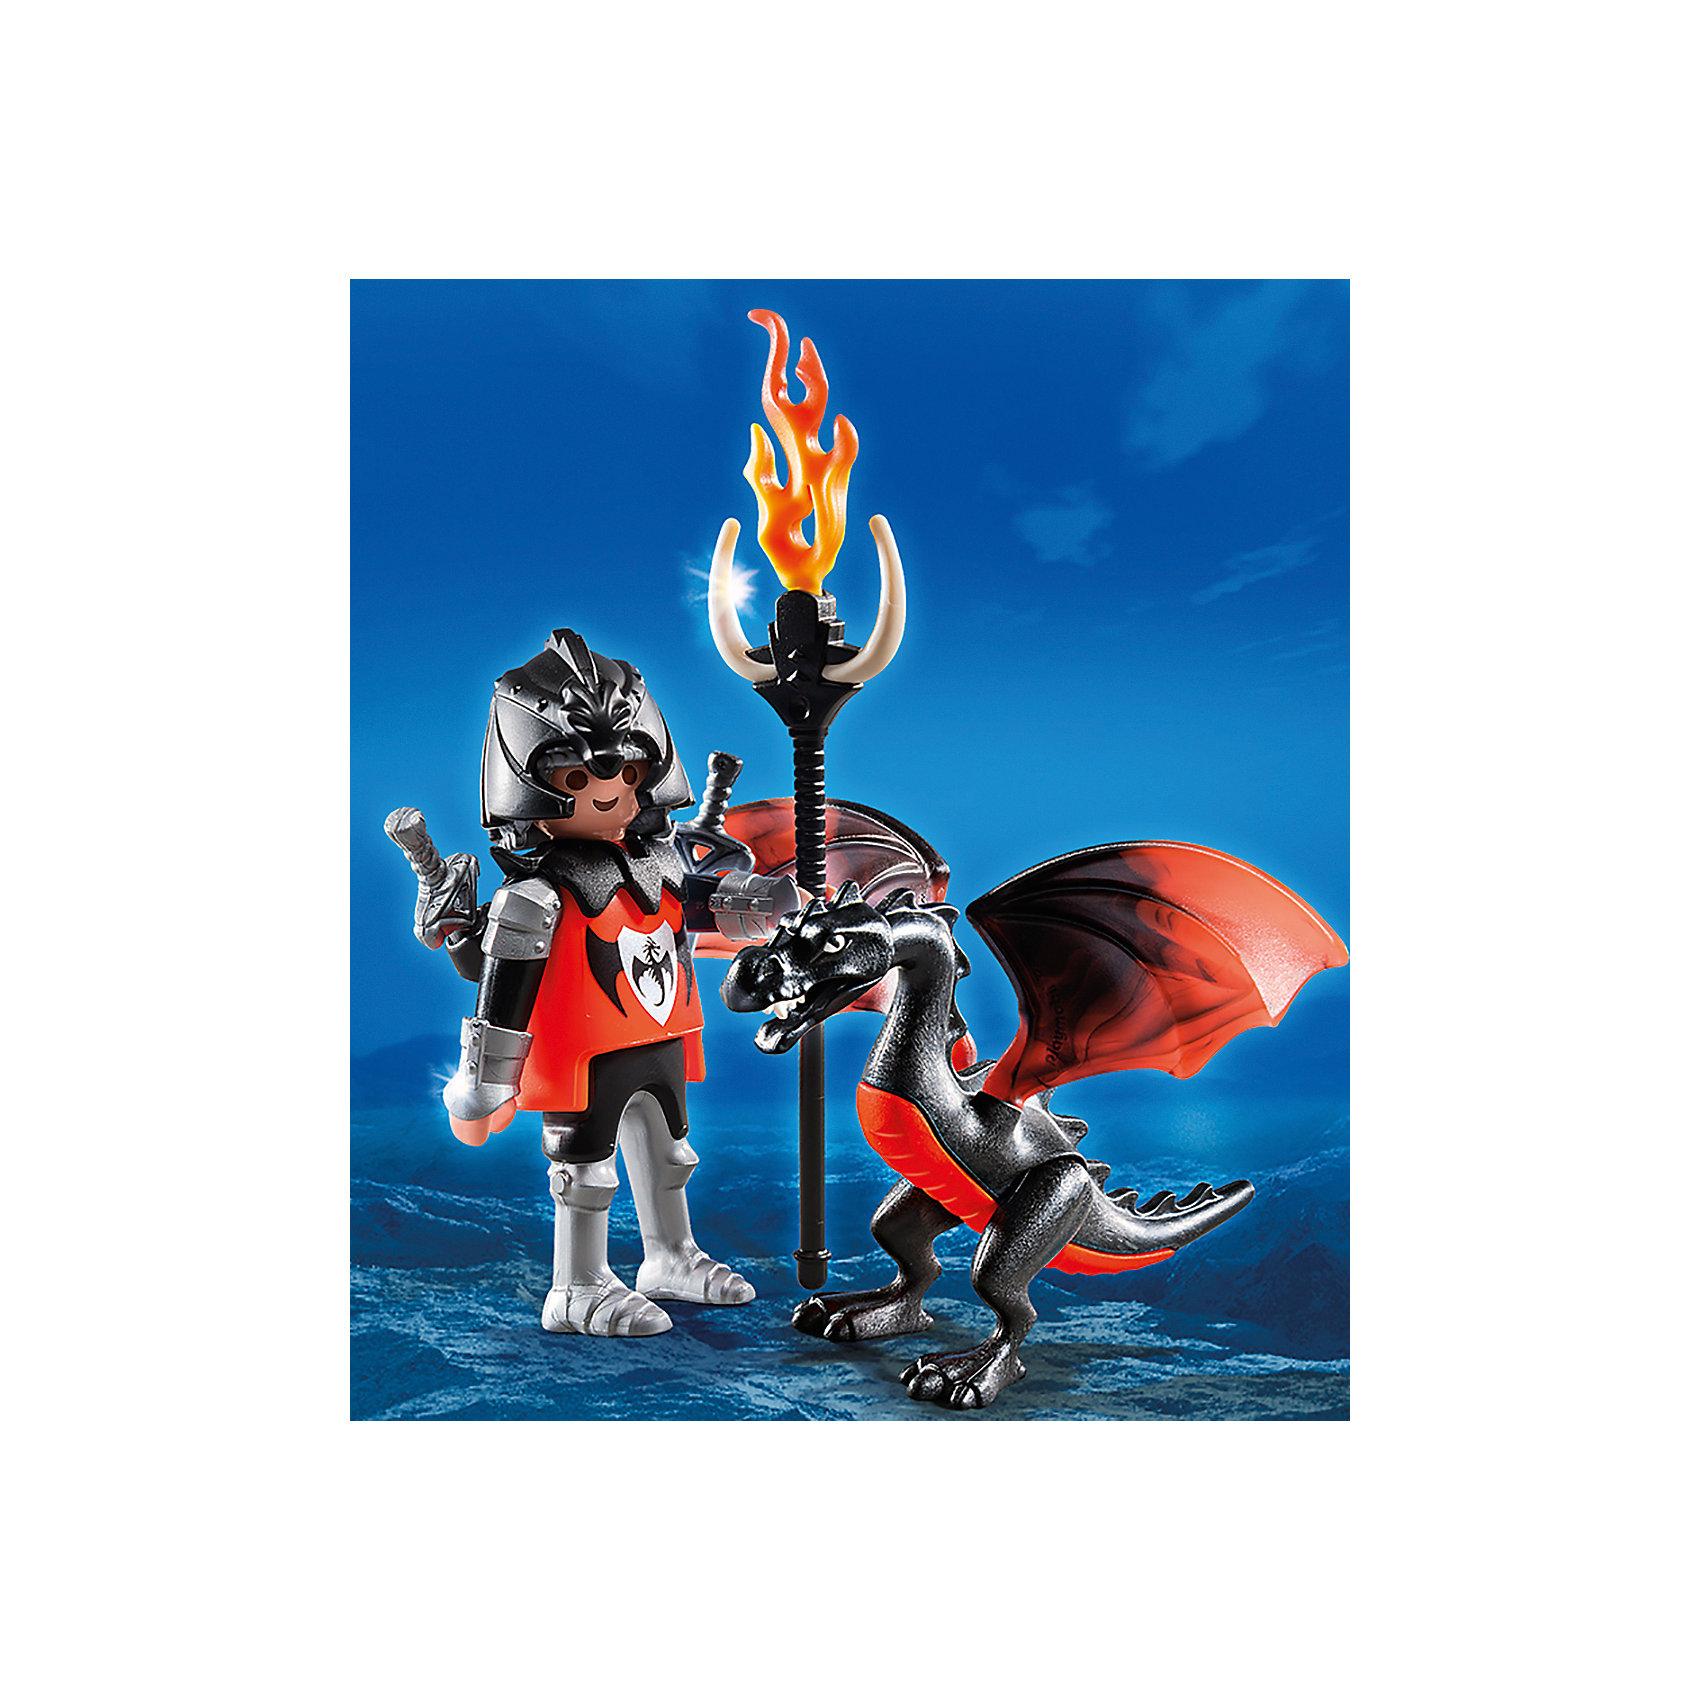 PLAYMOBIL® Экстра-набор: Рыцарь с Драконом, PLAYMOBIL playmobil® экстра набор фея с оленем playmobil